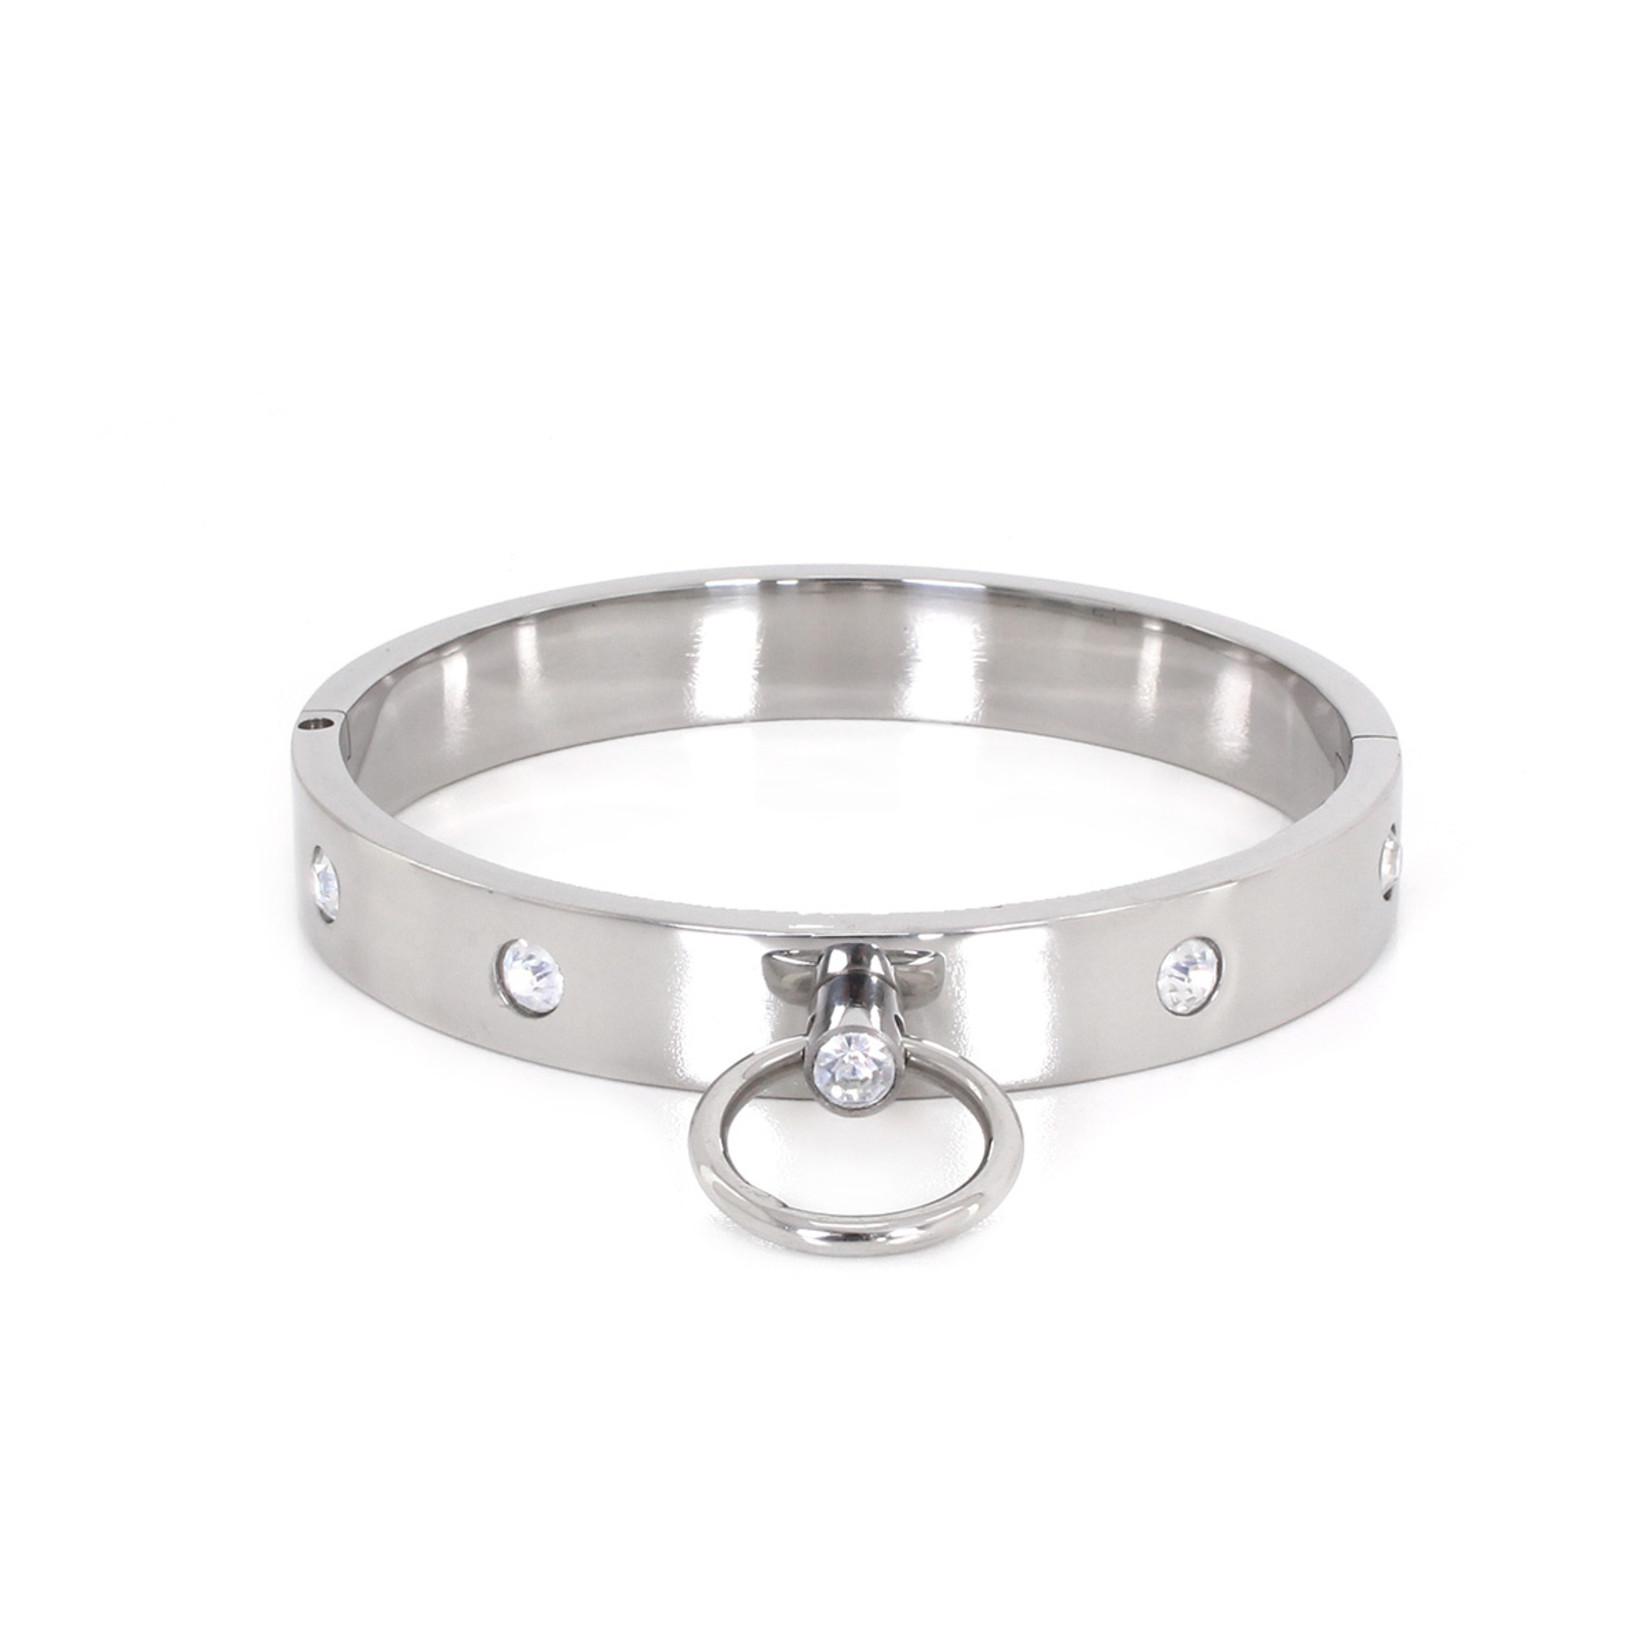 KIOTOS Steel Steel Collar with Gems L 13.5 cm